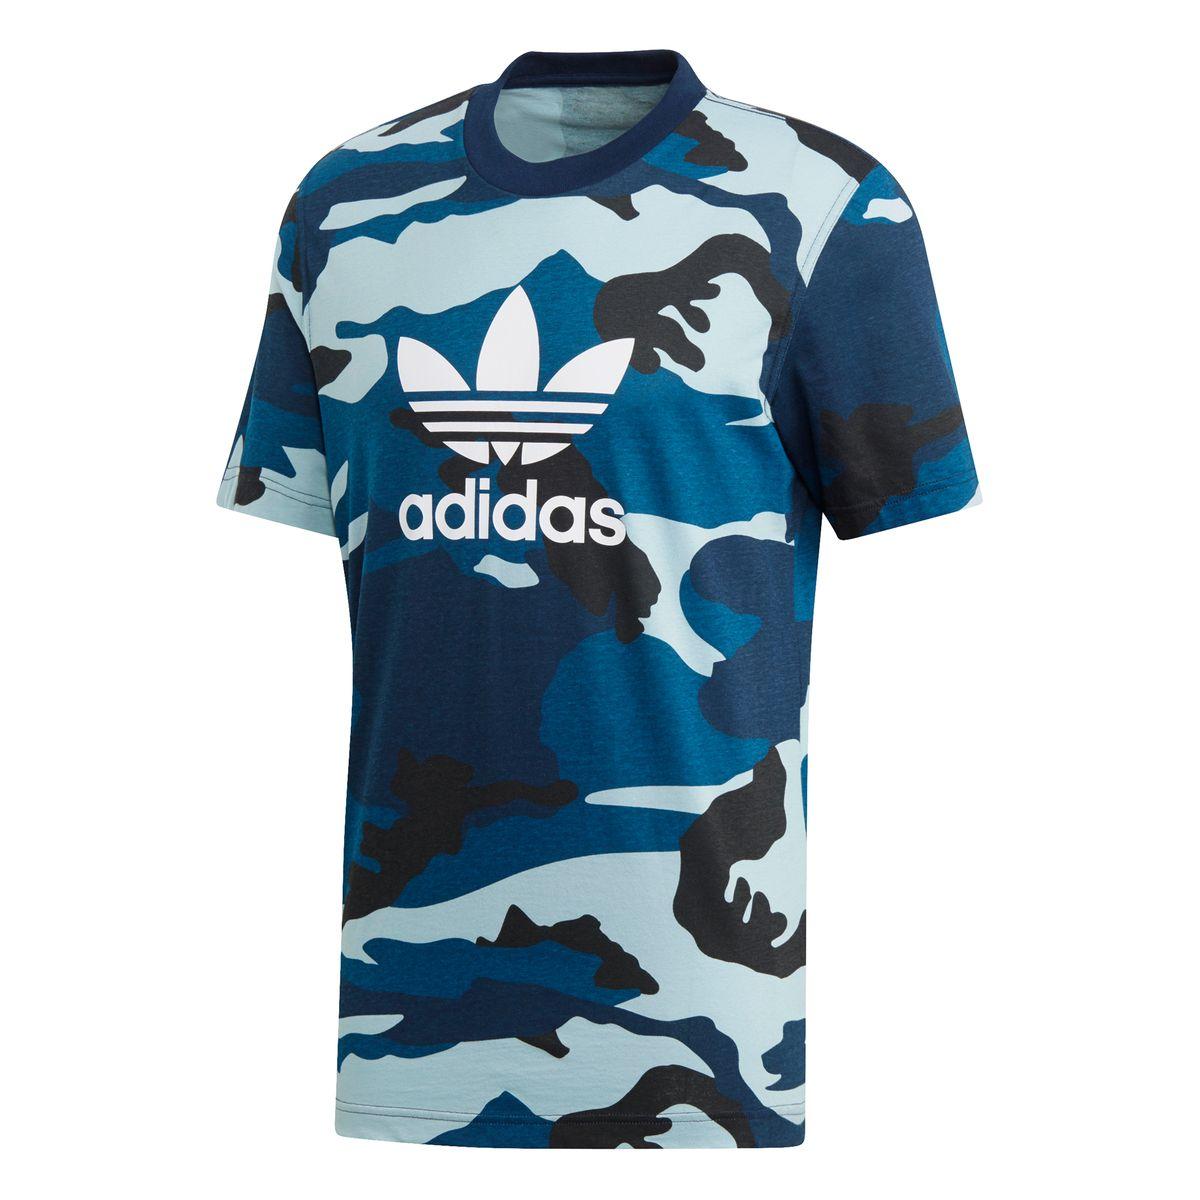 t shirt adidas militaire